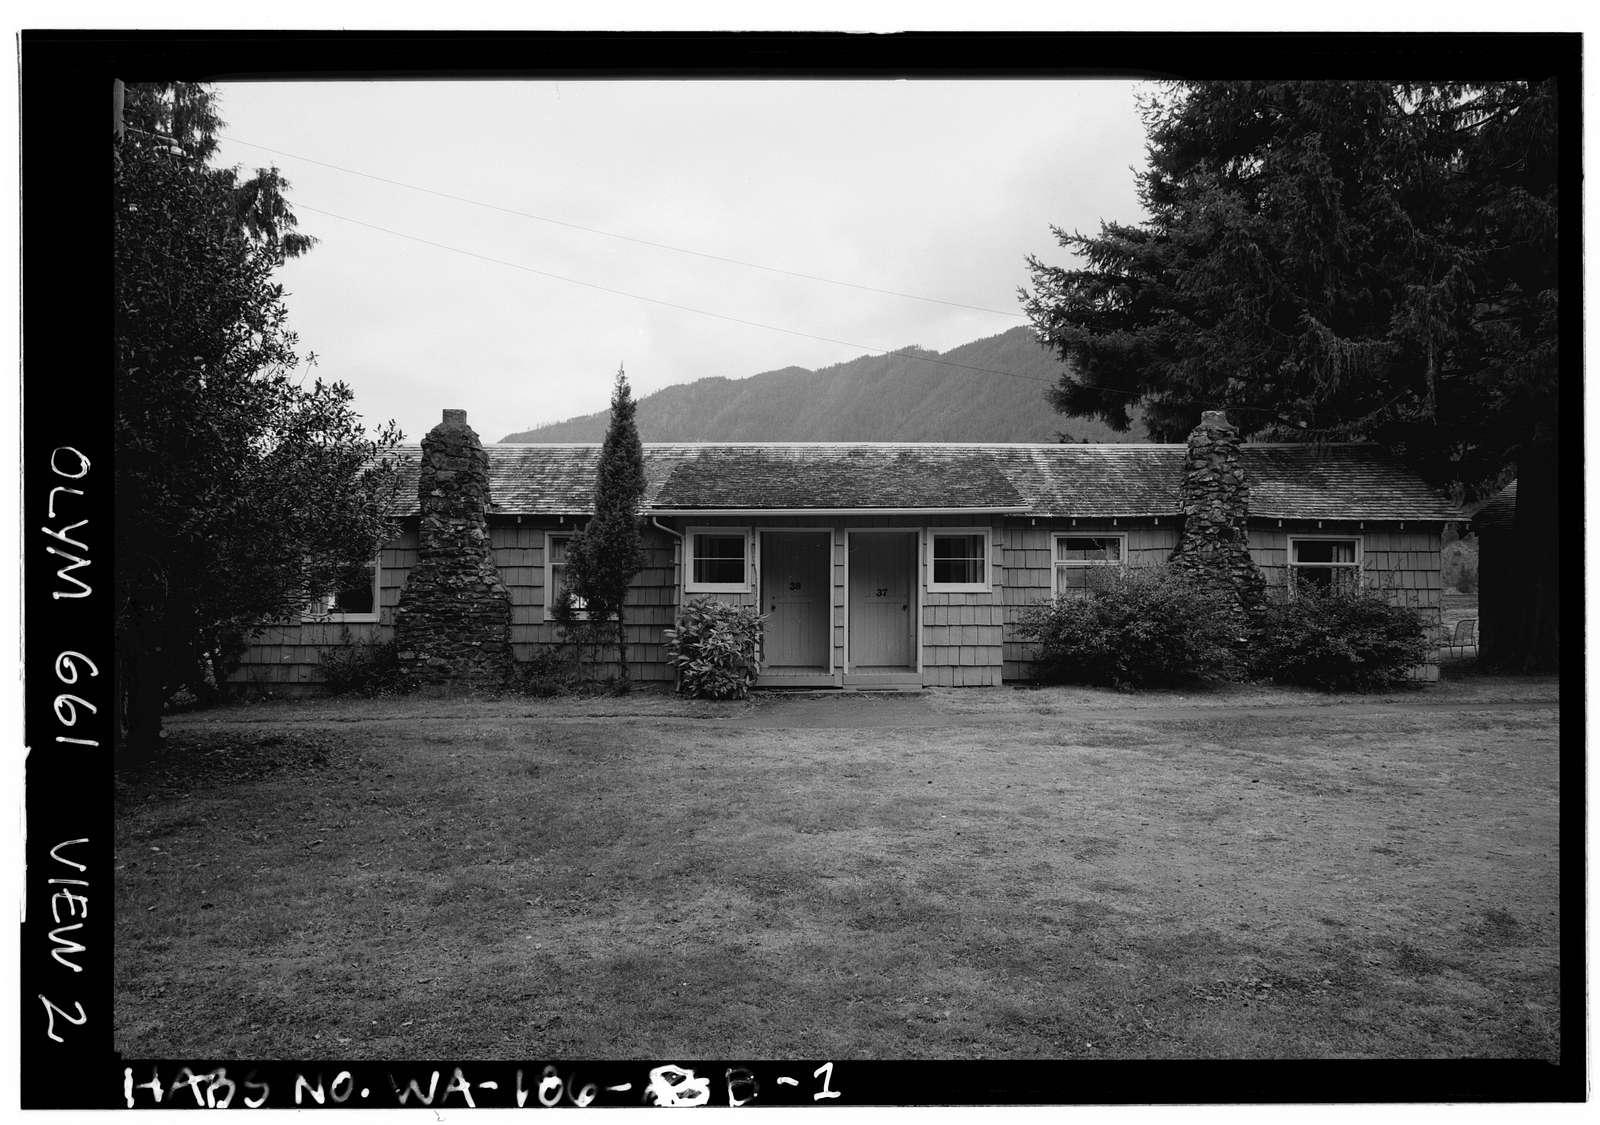 Singer's Lake Crescent Tavern, Duplex 37-38, Barnes Point, Lake Crescent , Port Angeles, Clallam County, WA